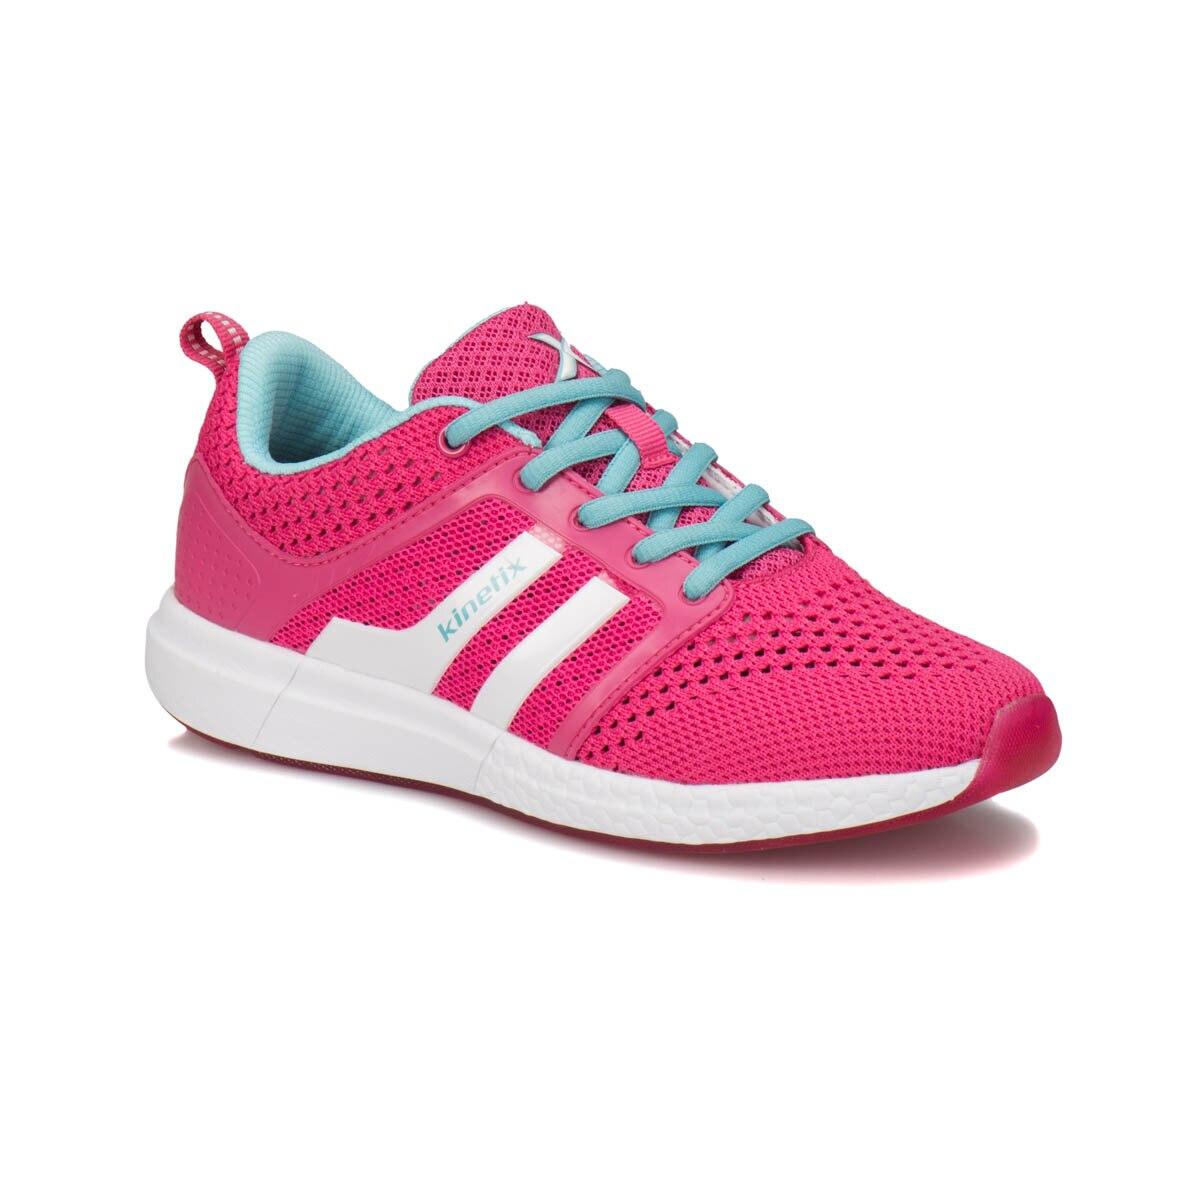 FLO VALENA Fuchsia Women Sneaker Shoes KINETIX